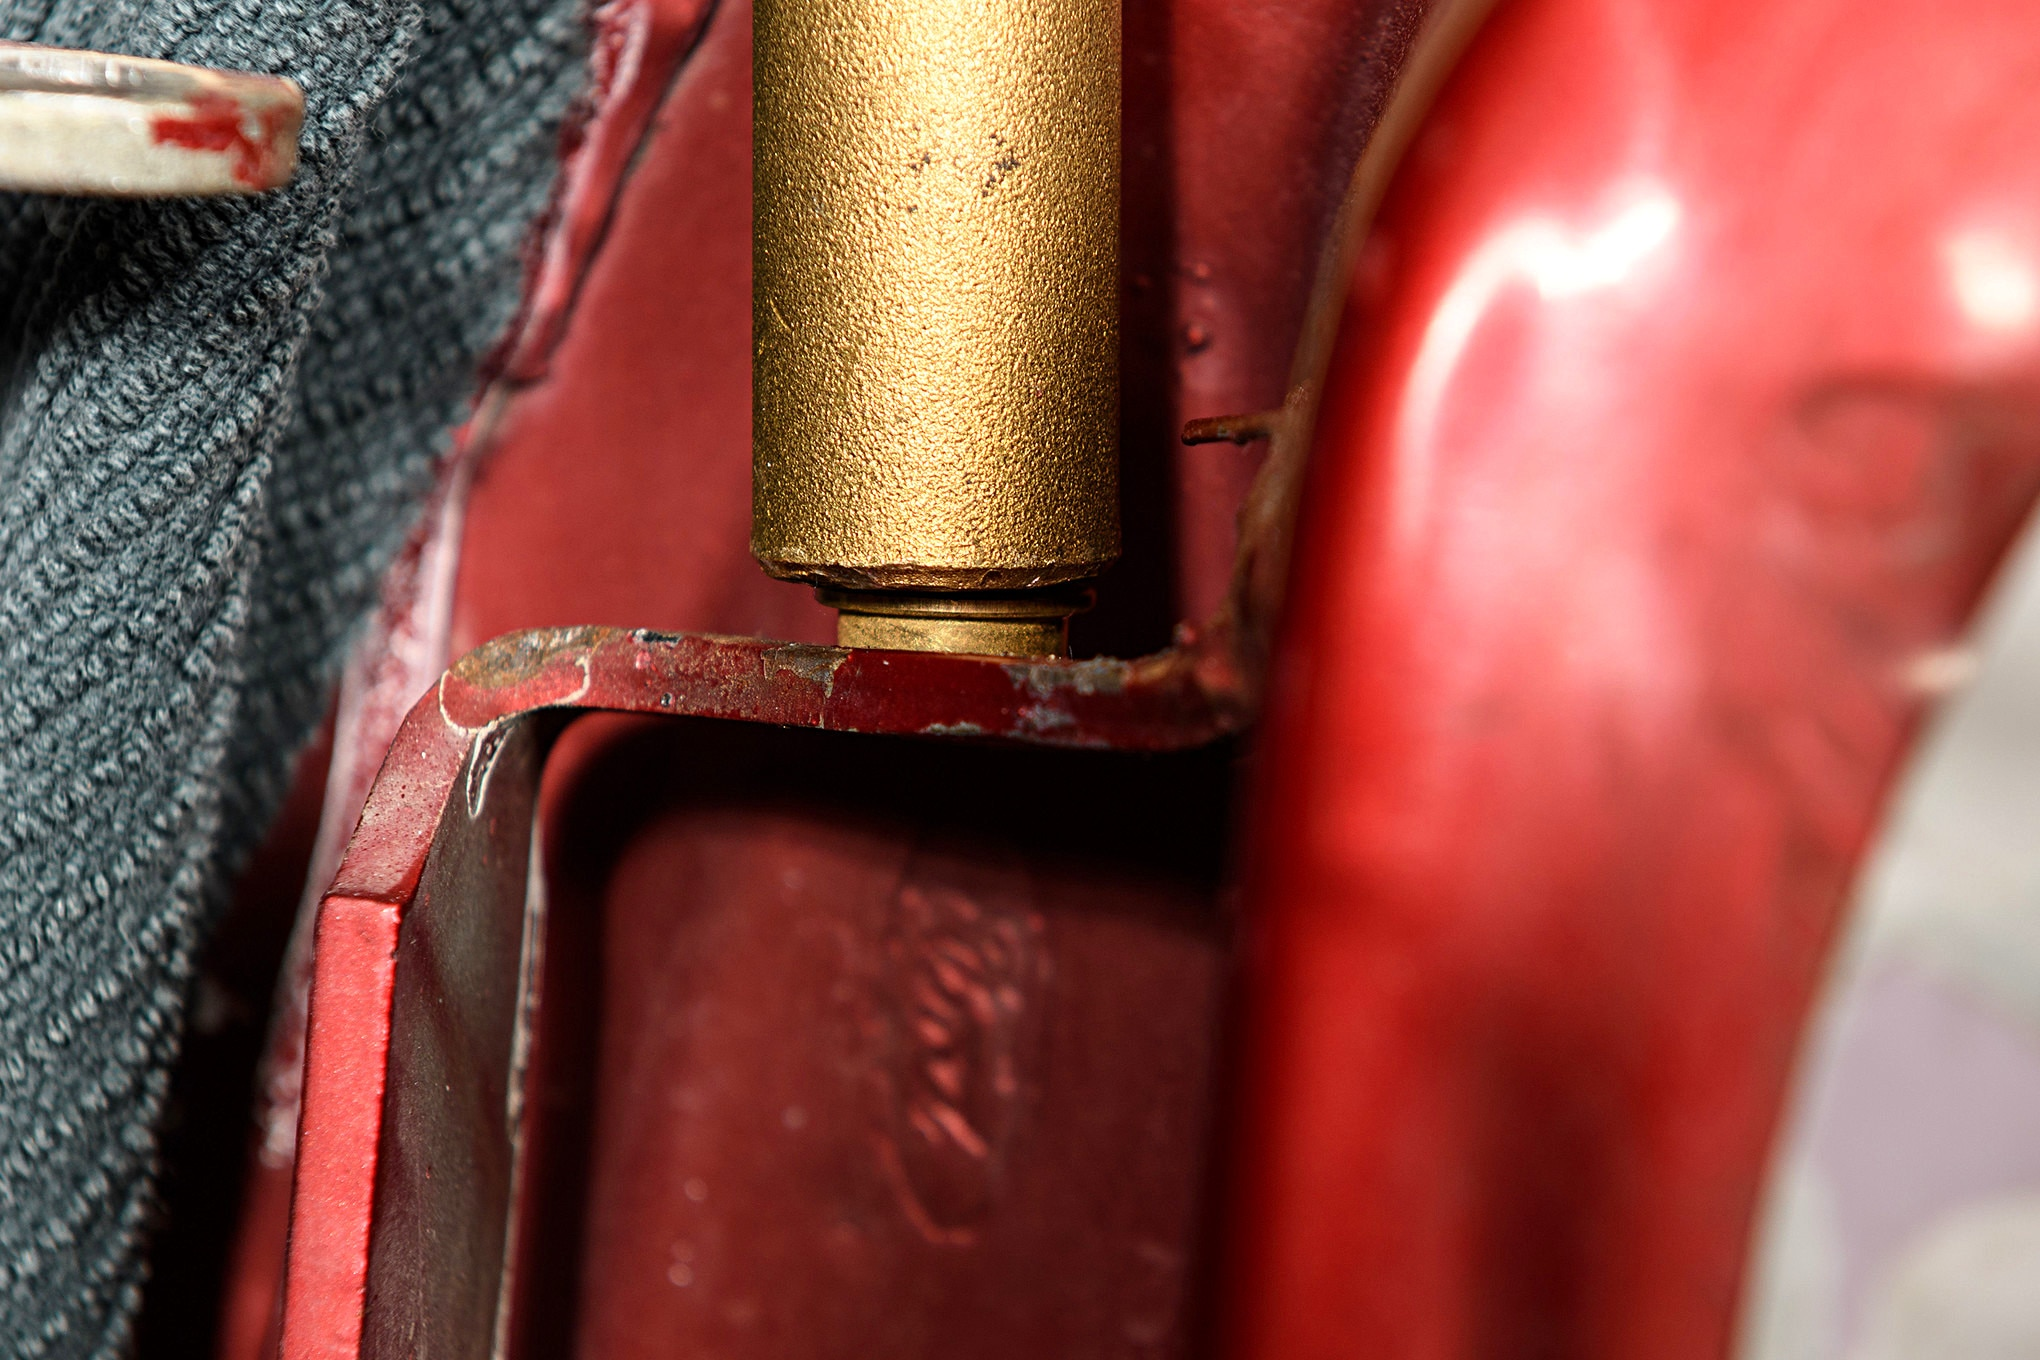 022 Mustang Door Hinge Bushing Installation